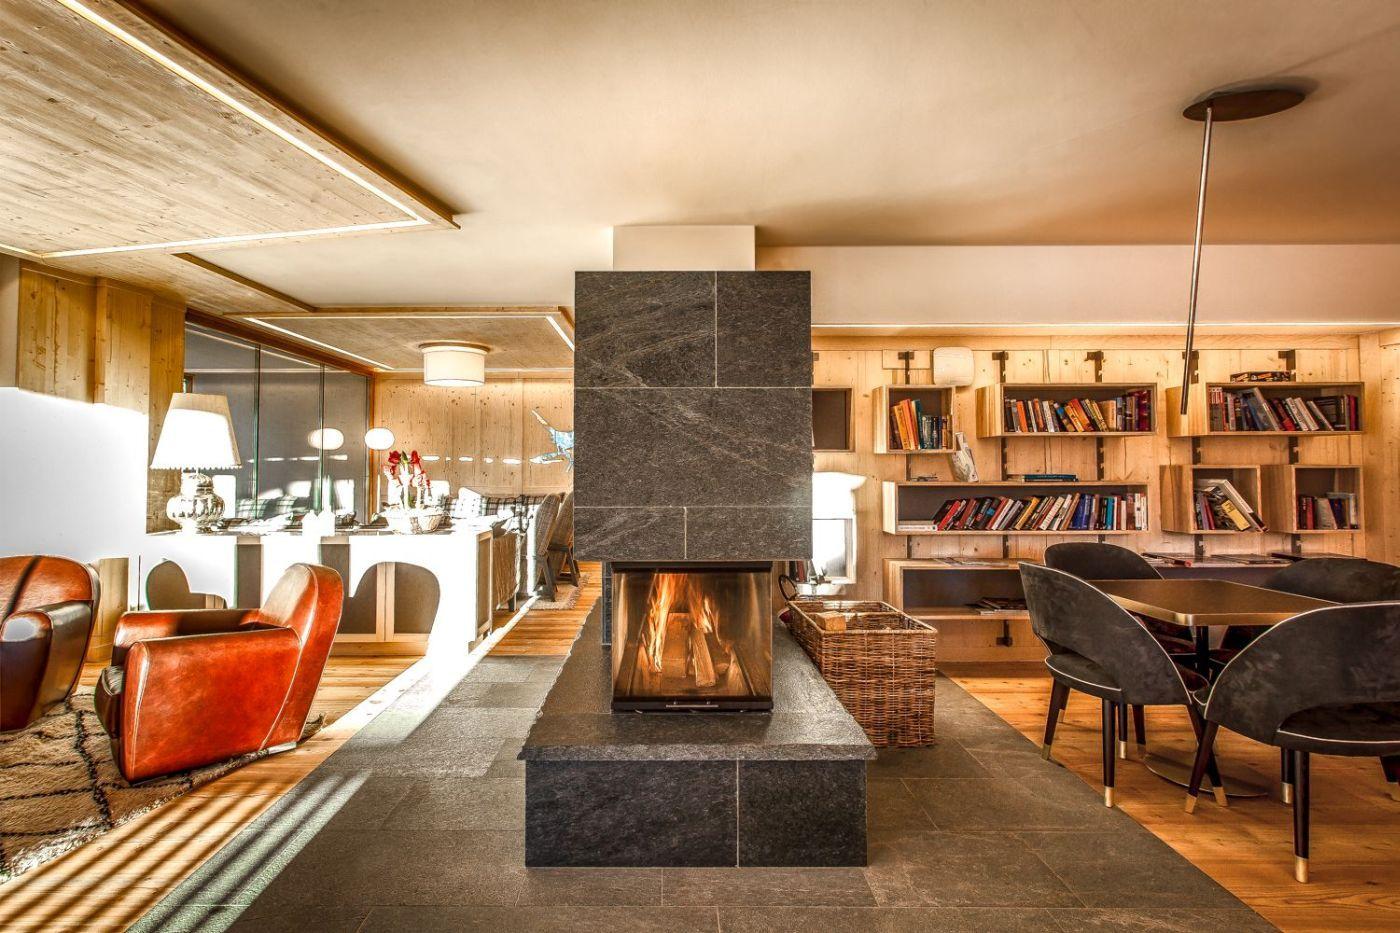 Rosaalpinahotelspa Interiors And Stuff Pinterest Hotel Spa - Hotel and spa rosa alpina